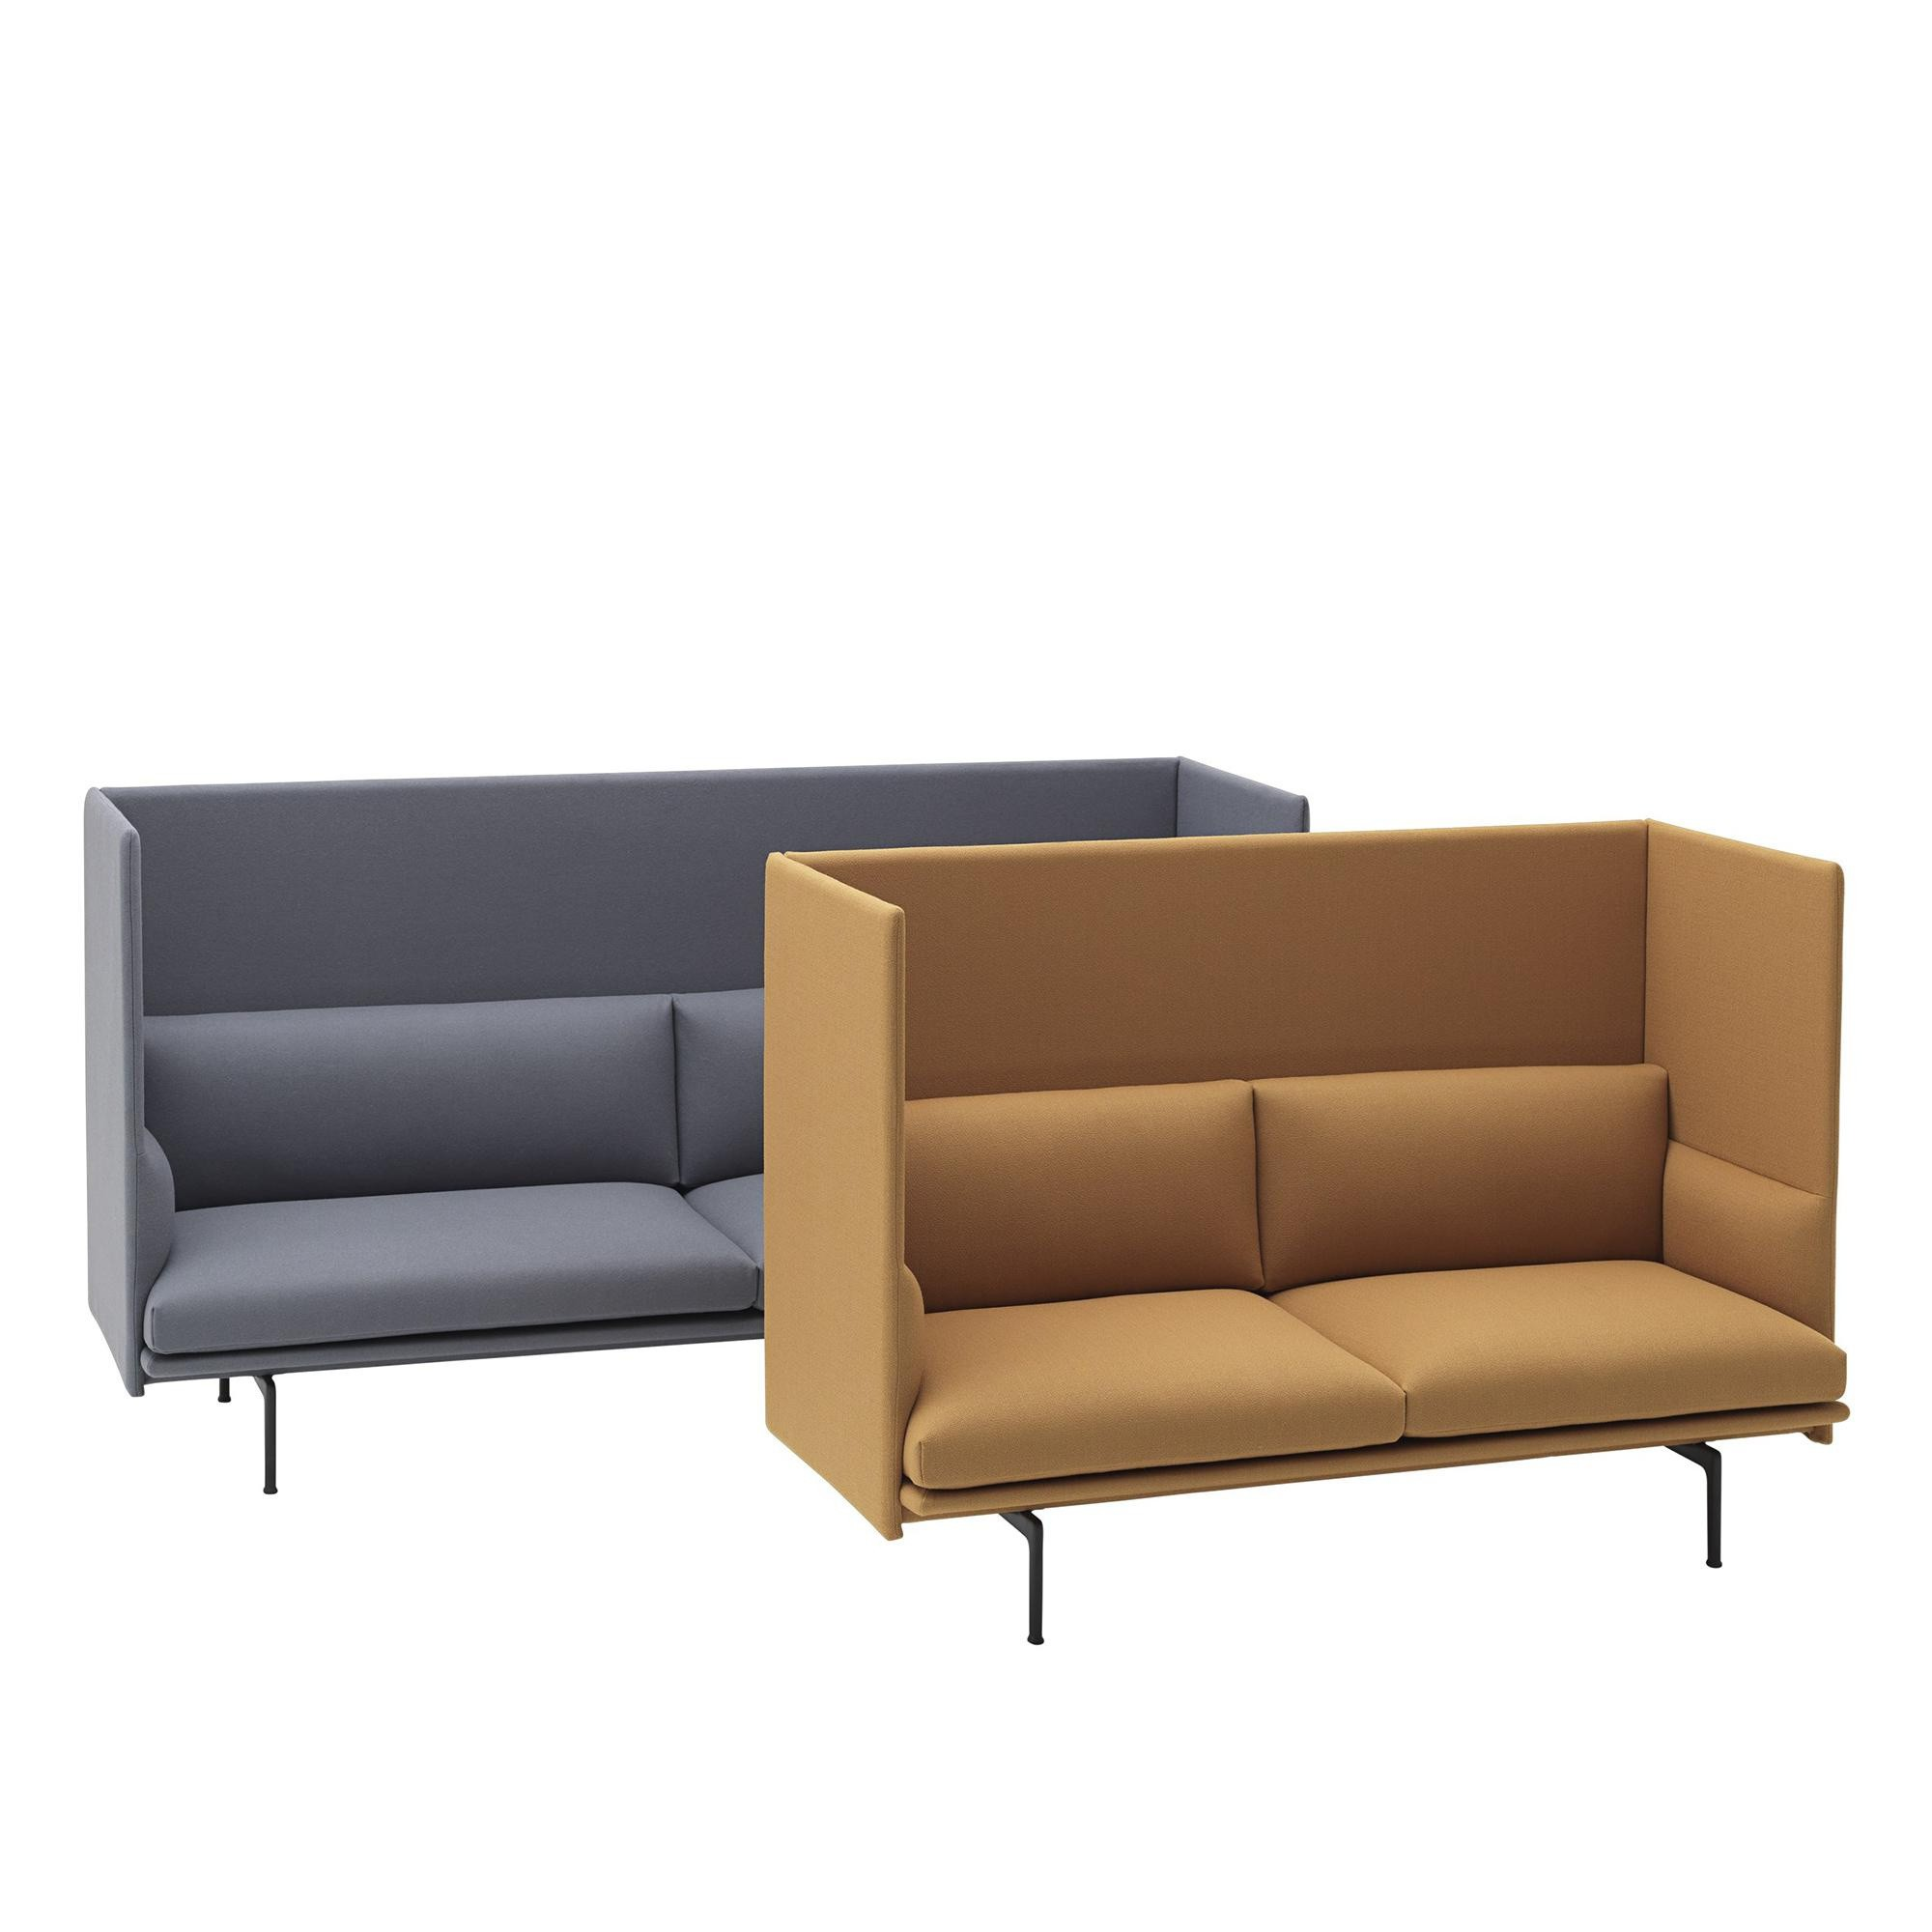 Outline Highback Sofa 2-Seater